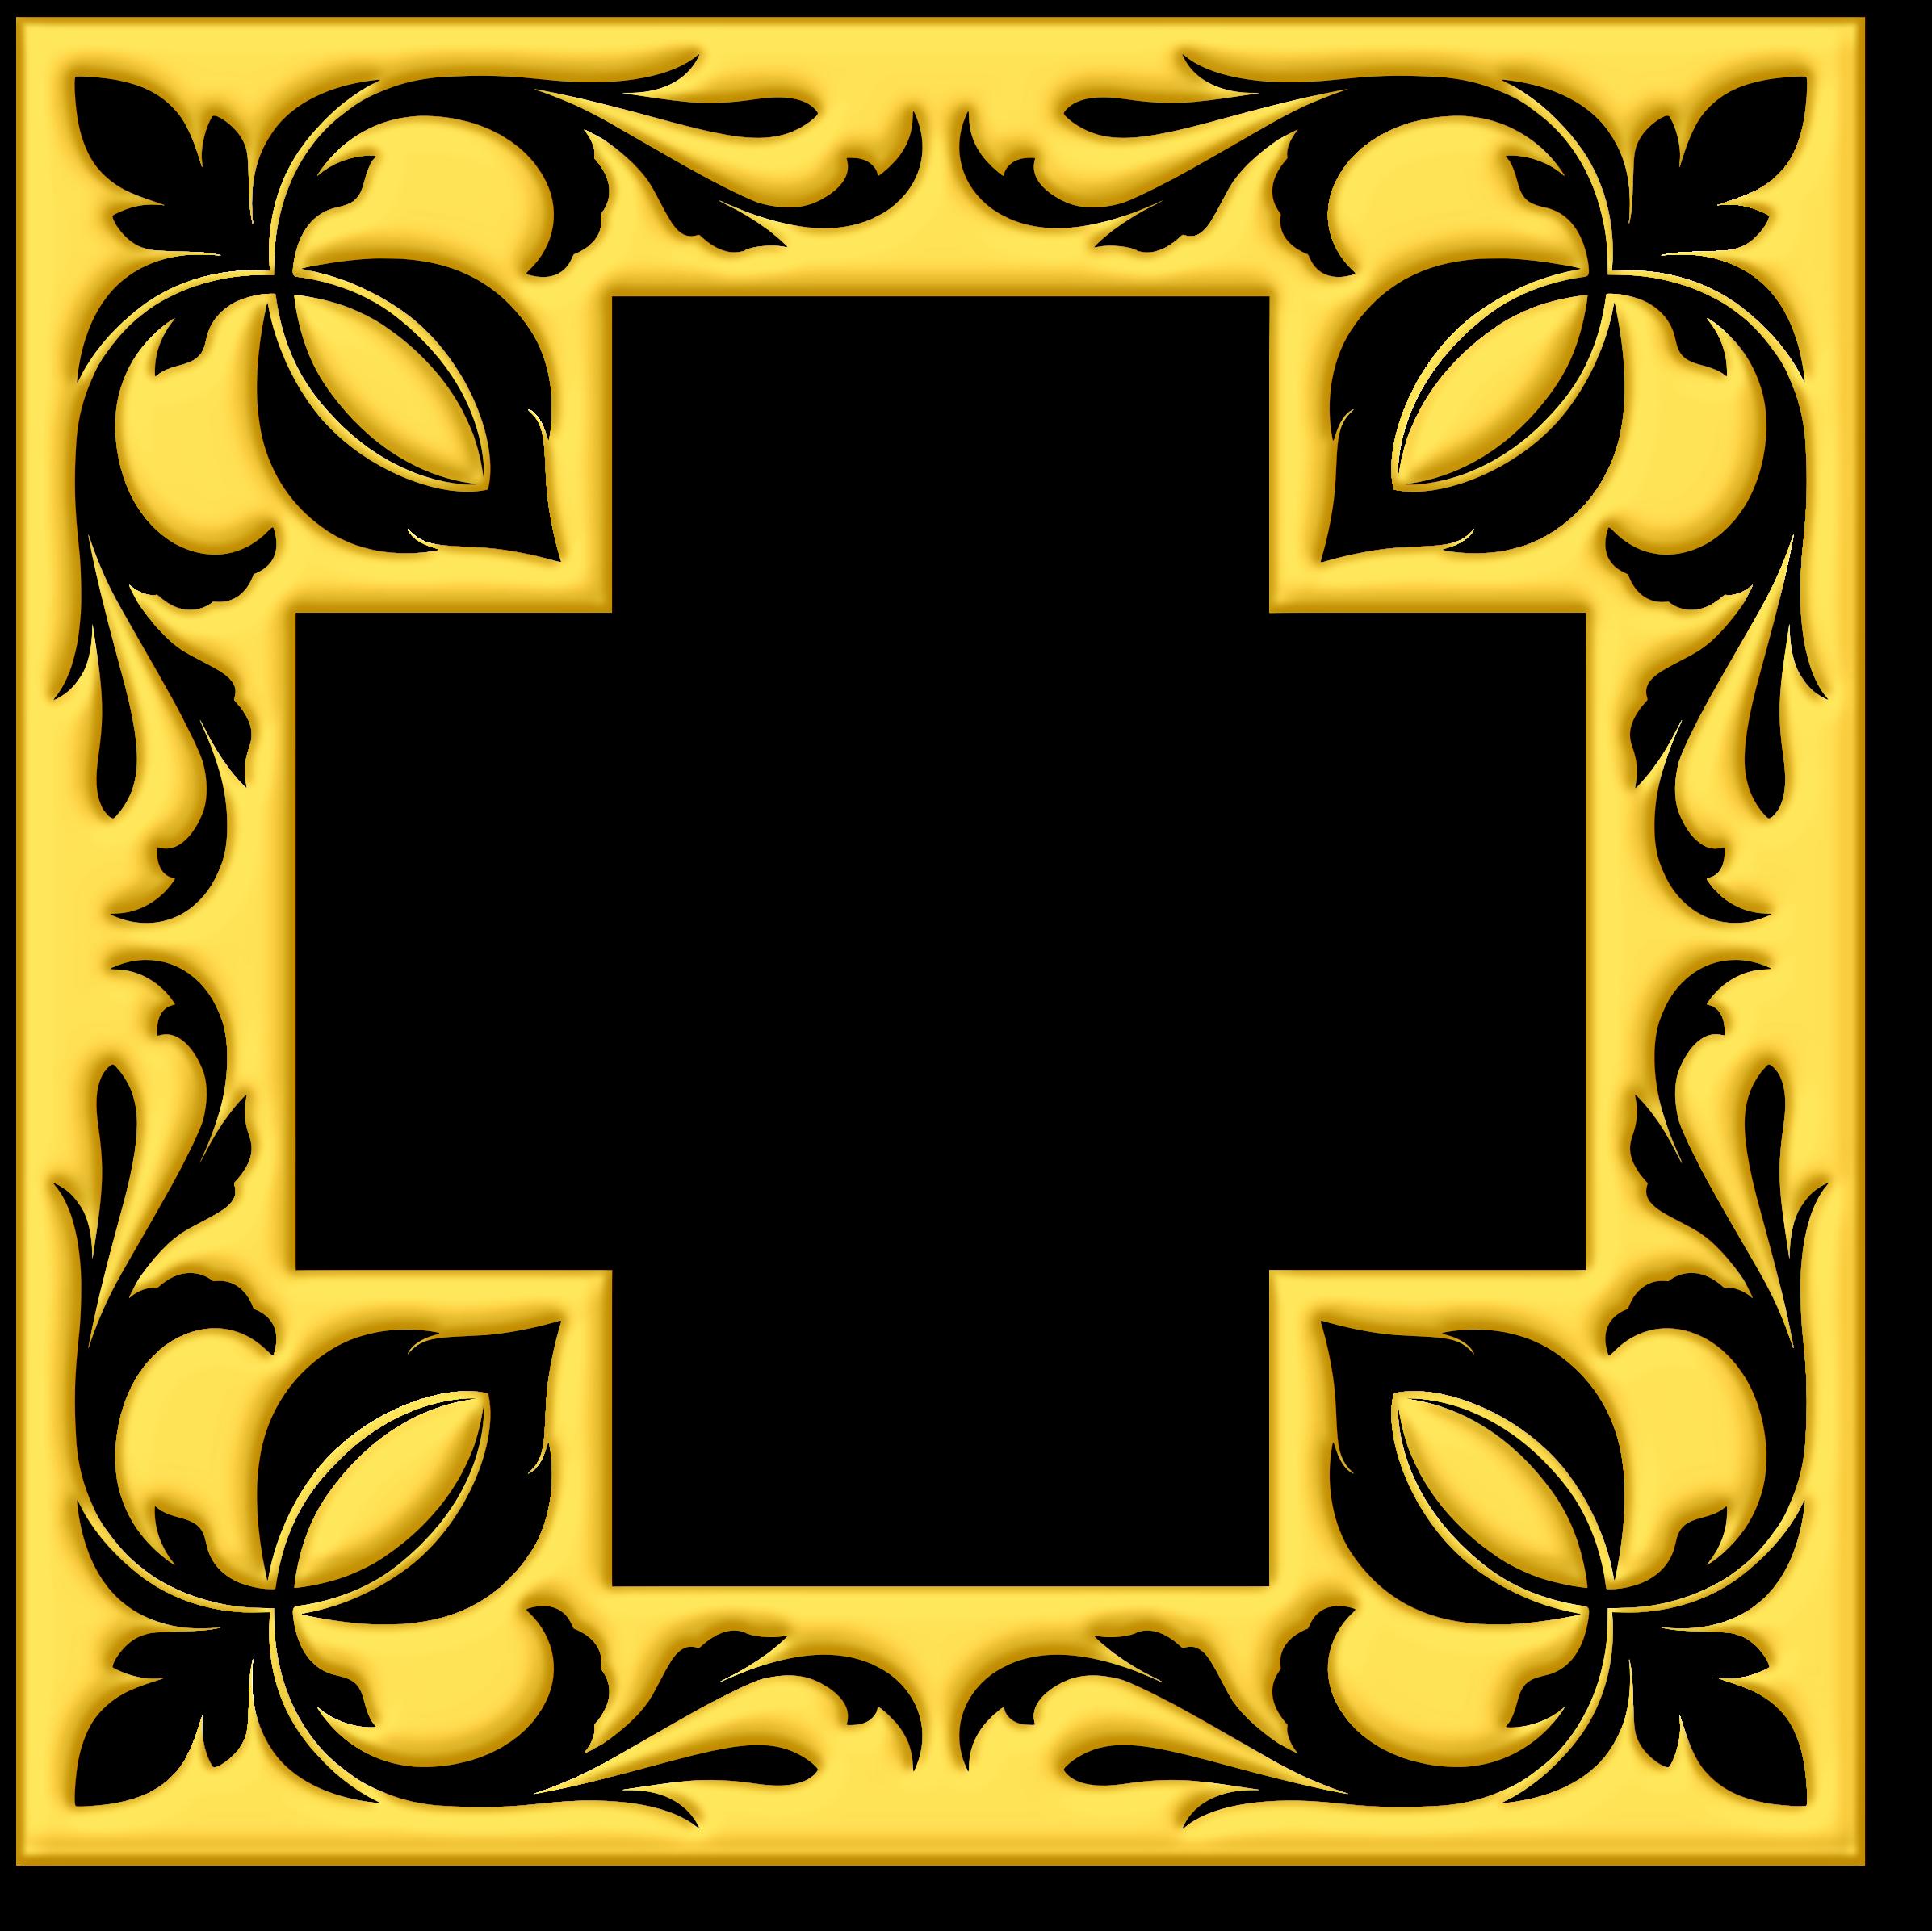 Clipart cross frame. Gold big image png